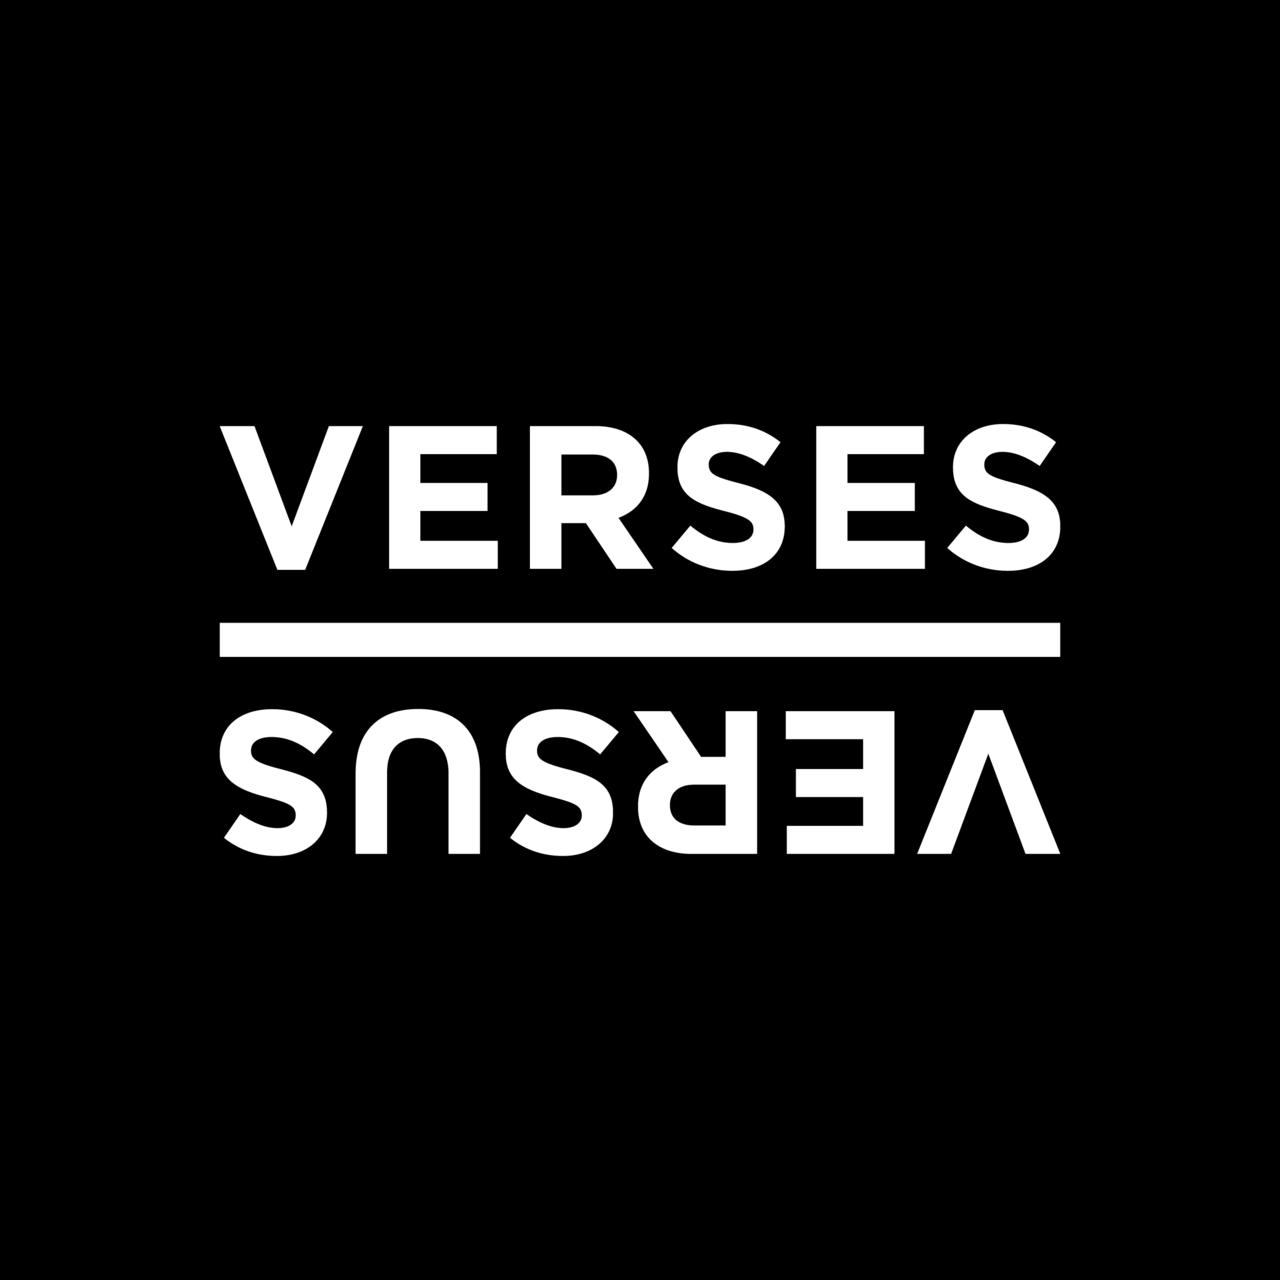 VersusVerses